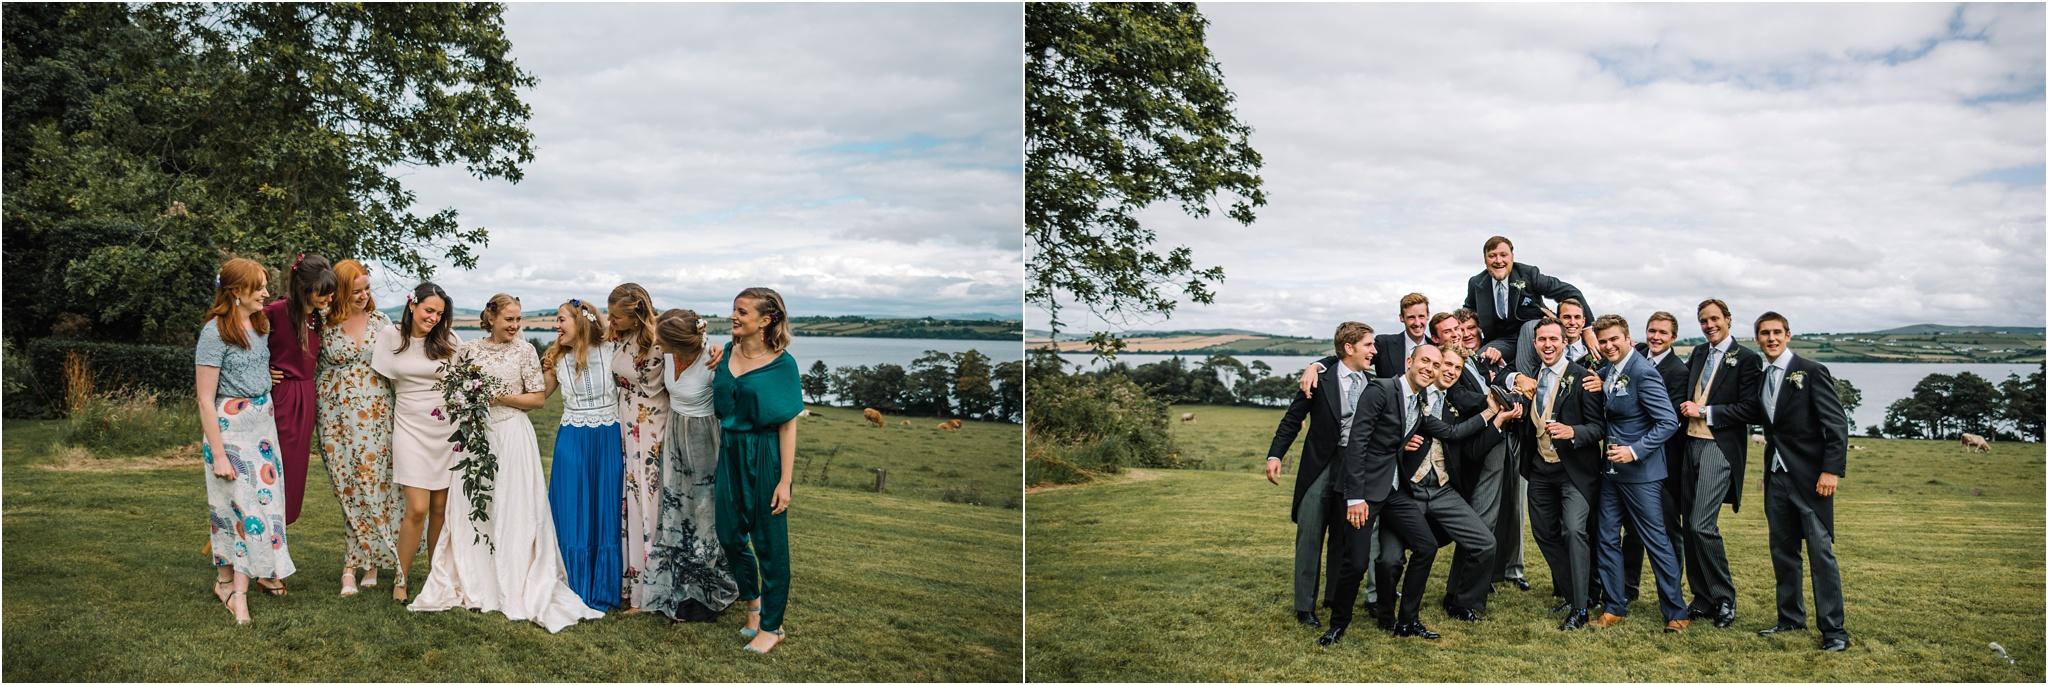 Outdoor-country-wedding-Edinburgh-photographer__0050.jpg